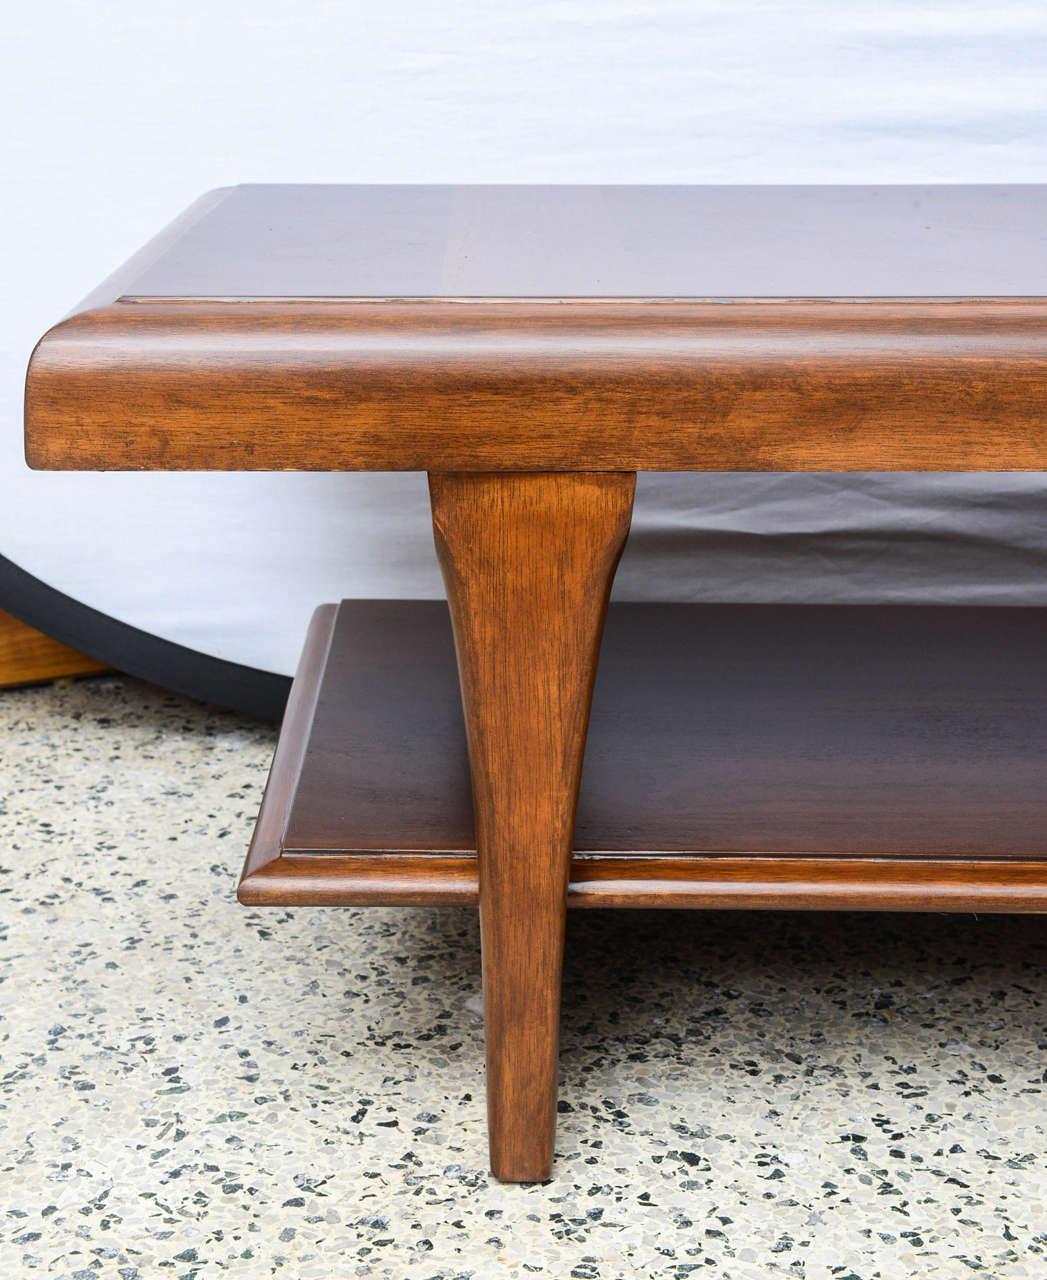 Lane Long Coffee Table: Long Lane Wooden Coffee Table, USA 1970s At 1stdibs